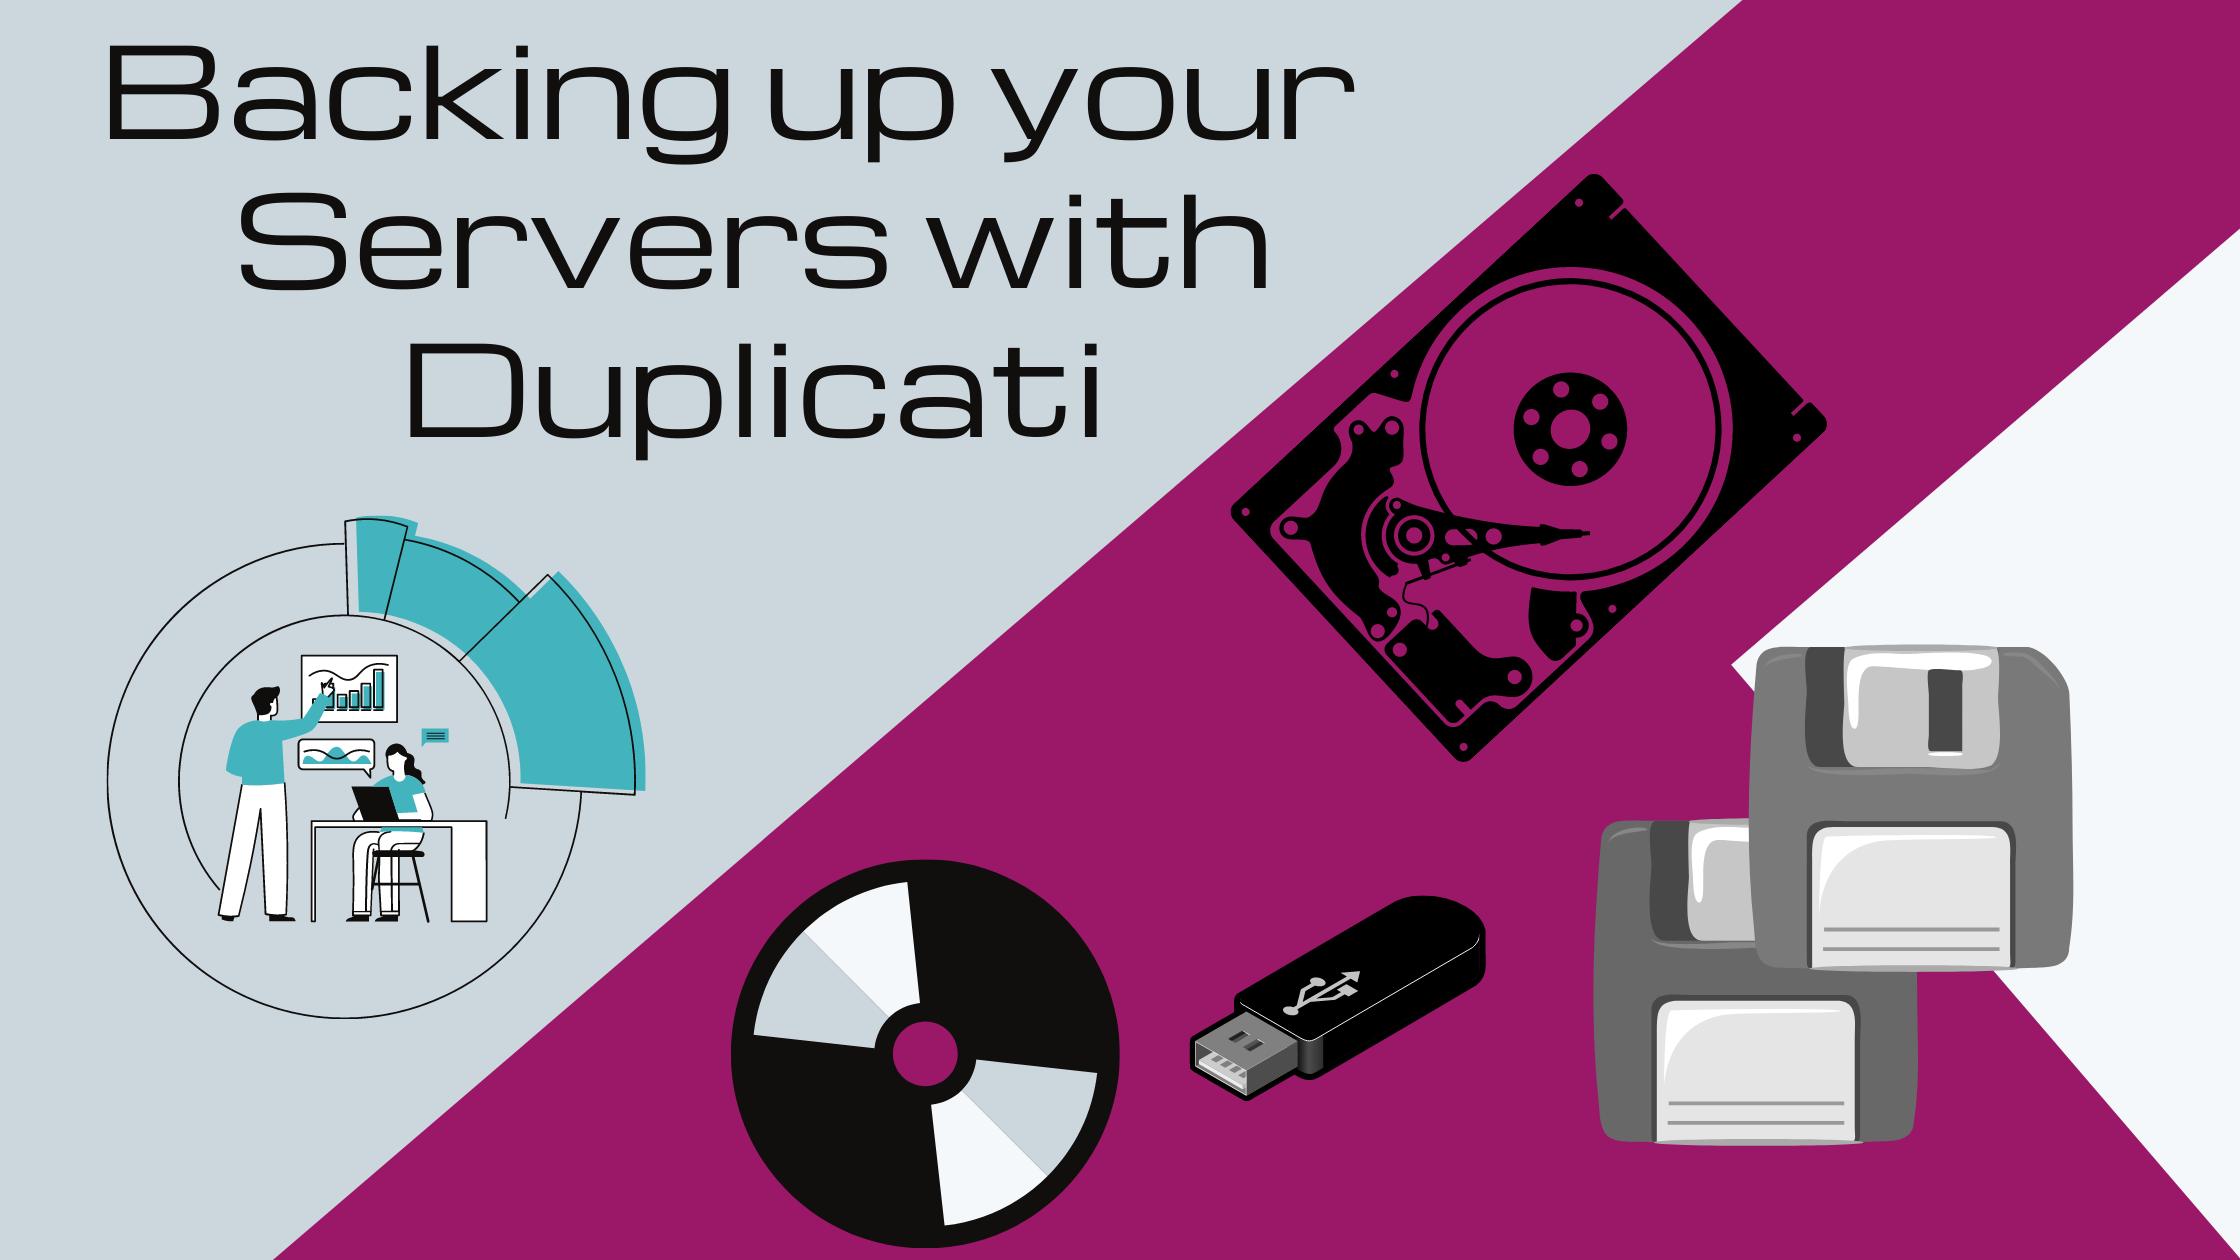 Backing up data with Duplicati